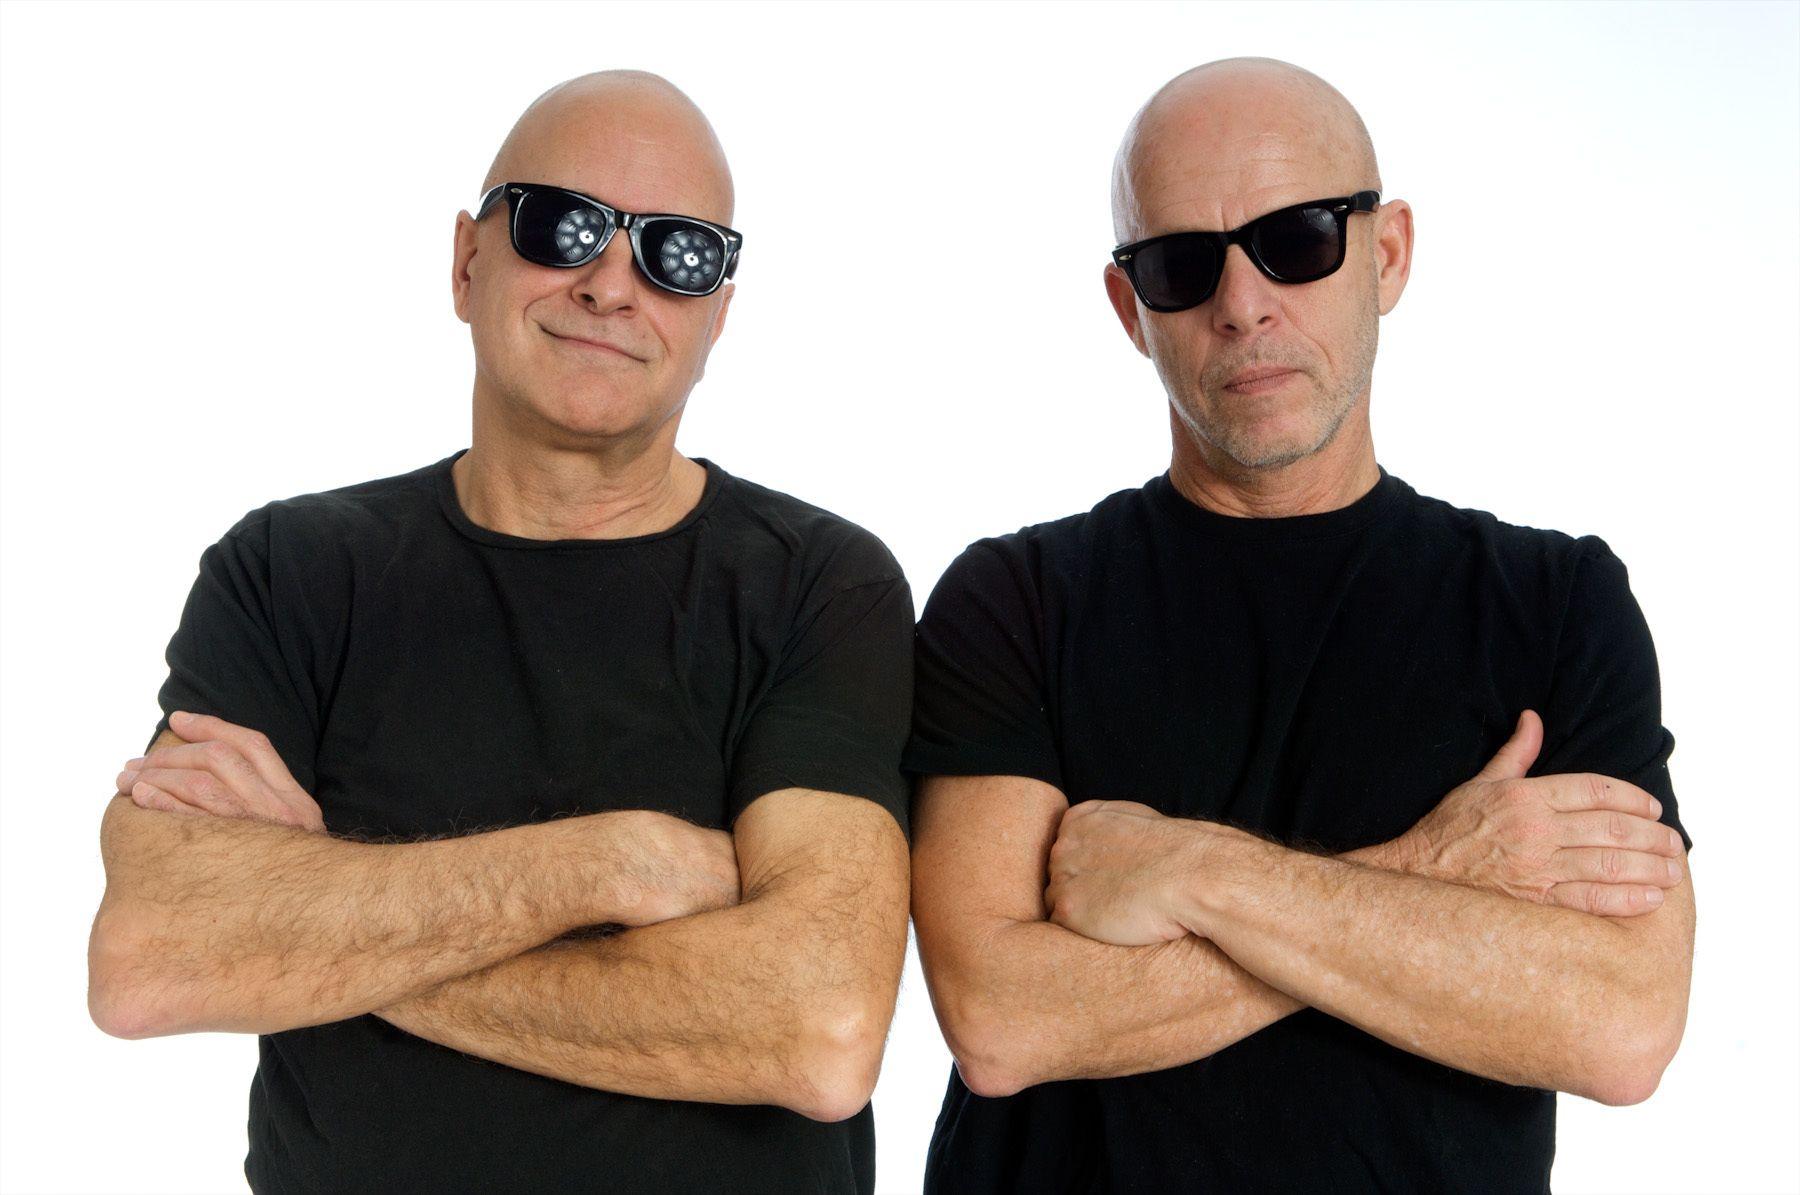 picture of bald men